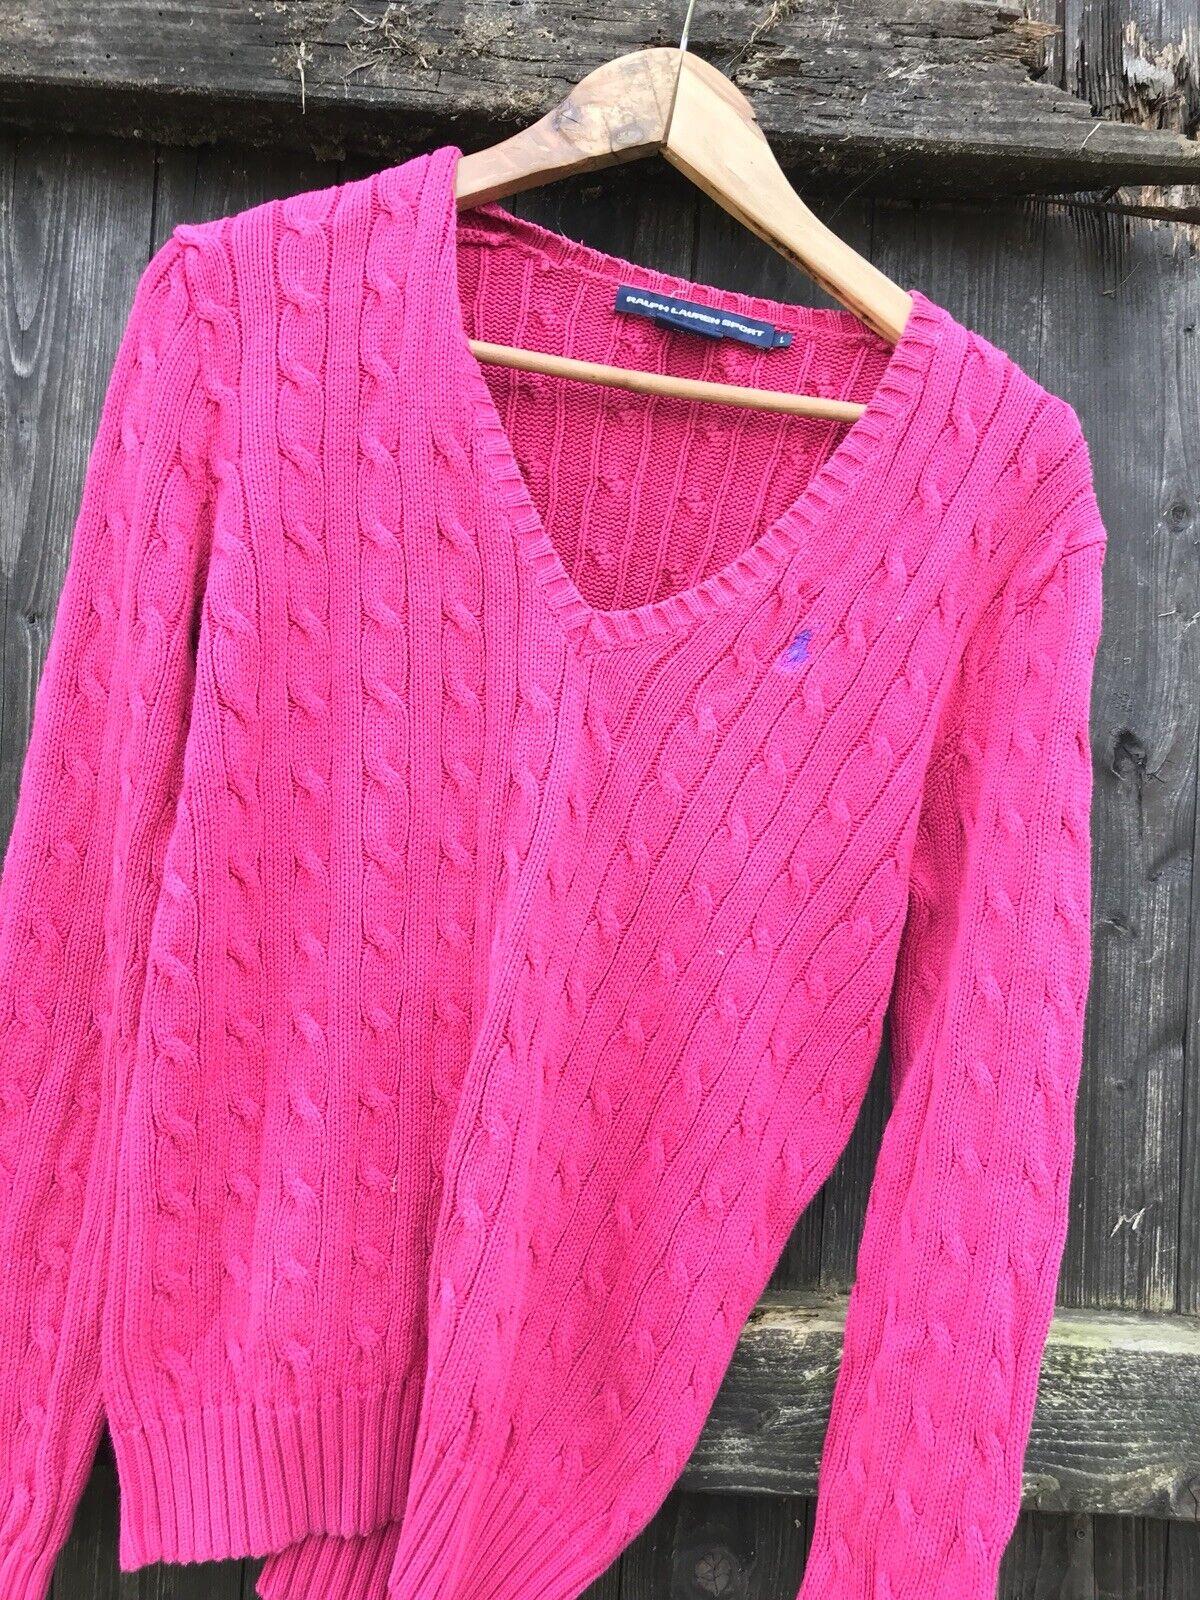 Ralph Lauren Polo Sport Ladies Cable Knit Jumper Size Medium.